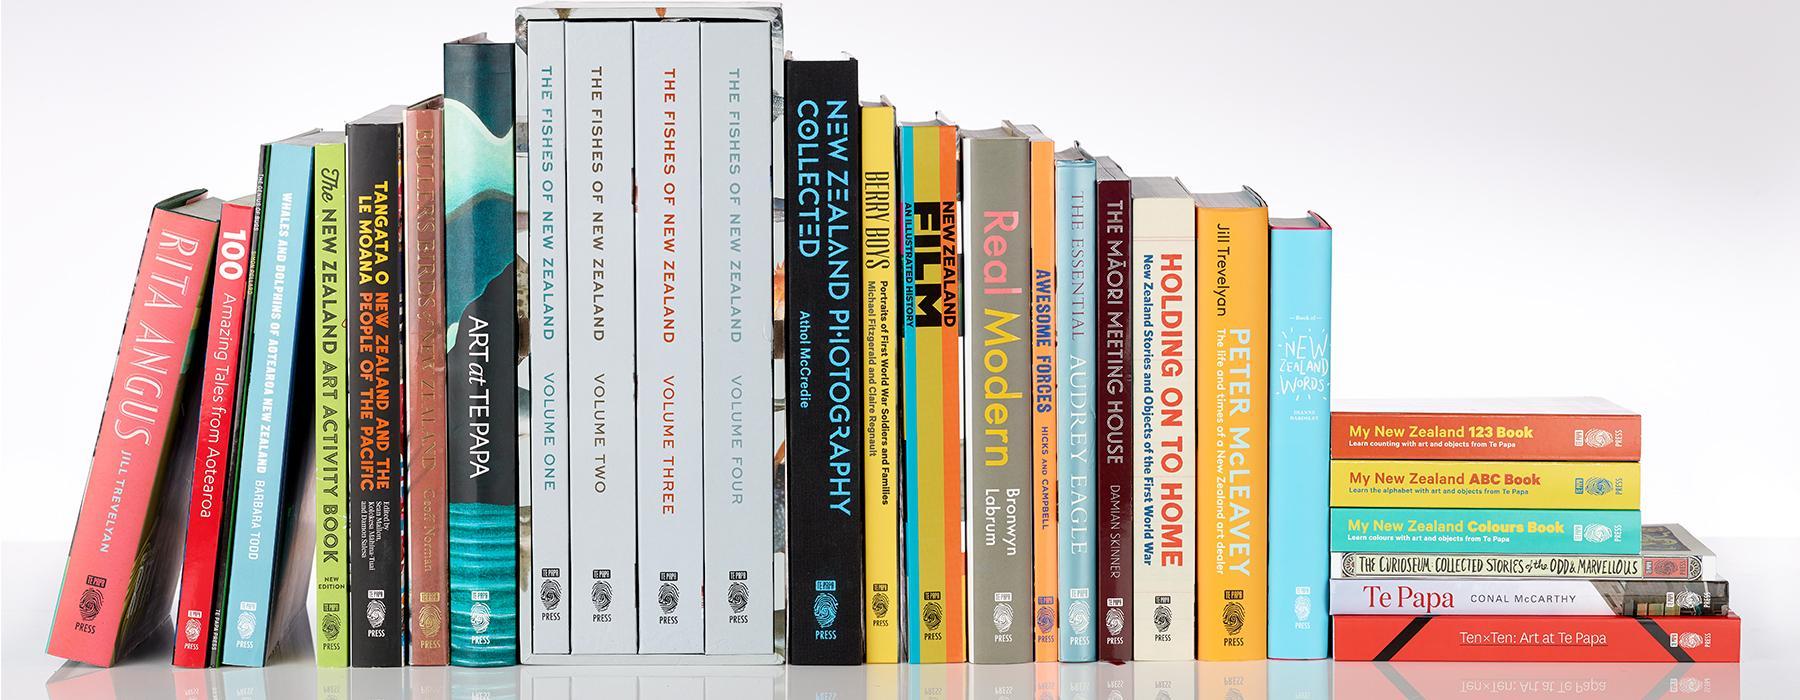 Selection of Te Papa Press titles, 2018. Photograph by Maarten Holl. Te Papa.